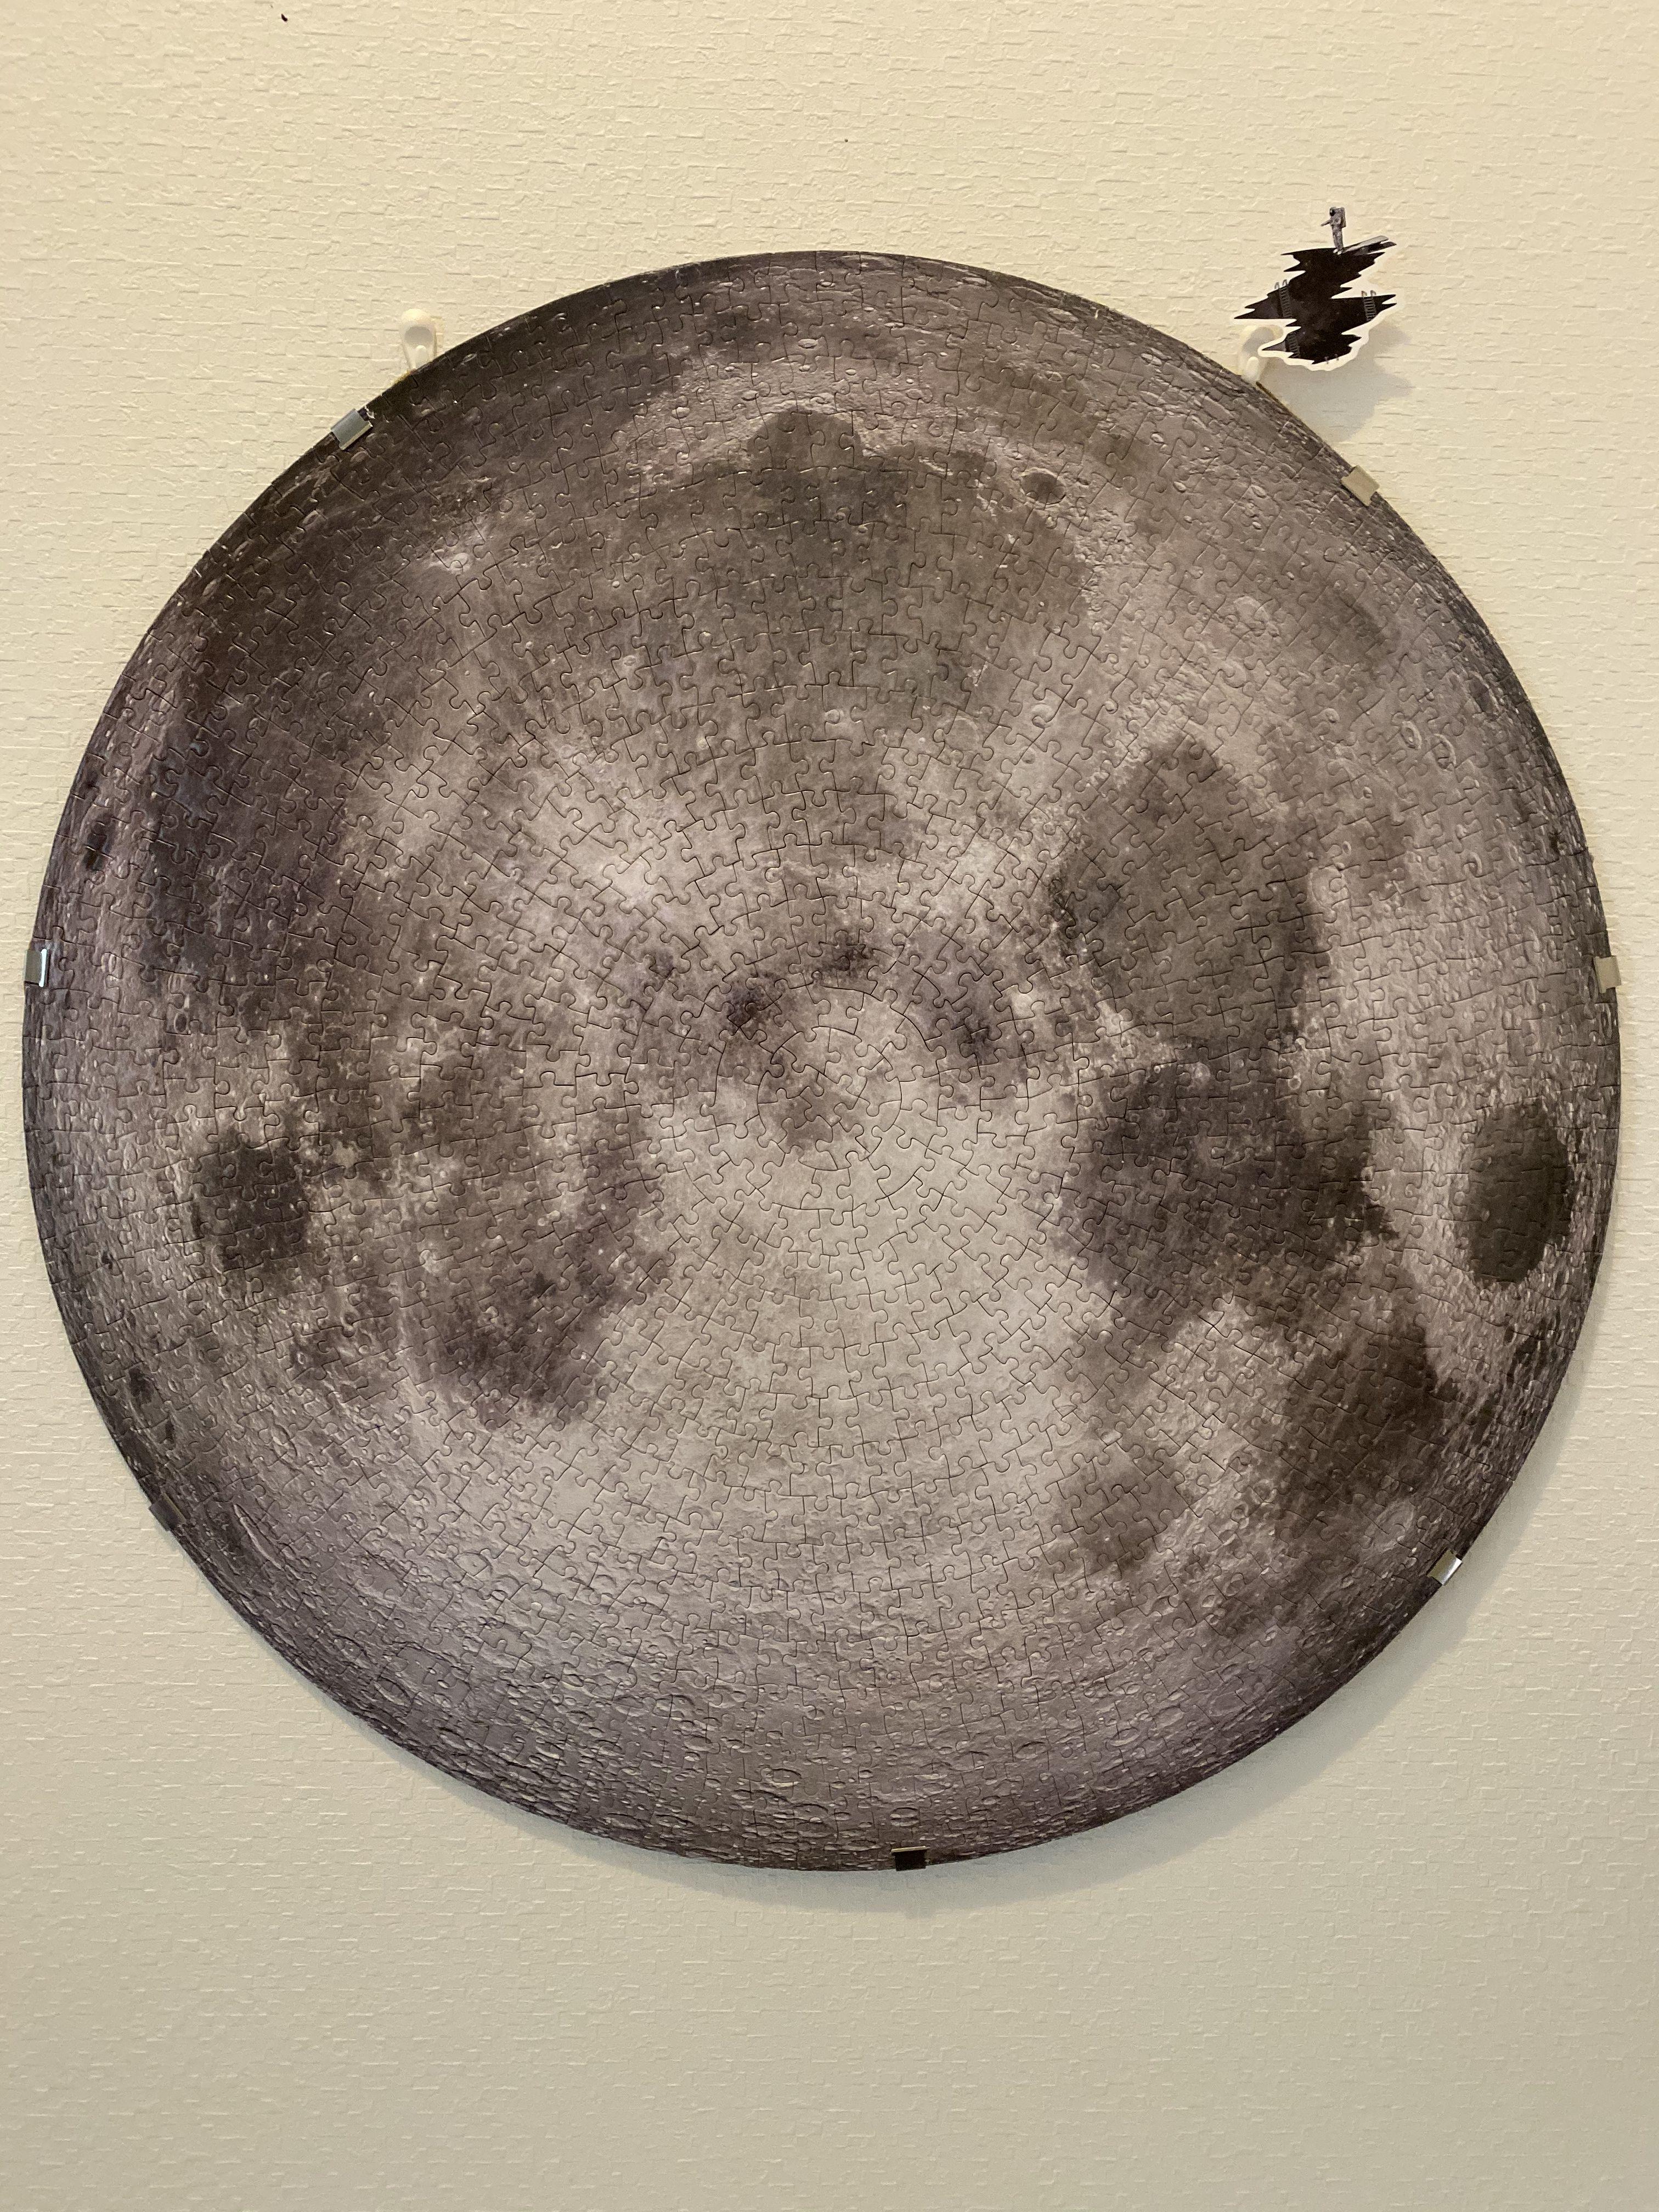 The Moon Apollo 11 Launch Moon Moon Surface